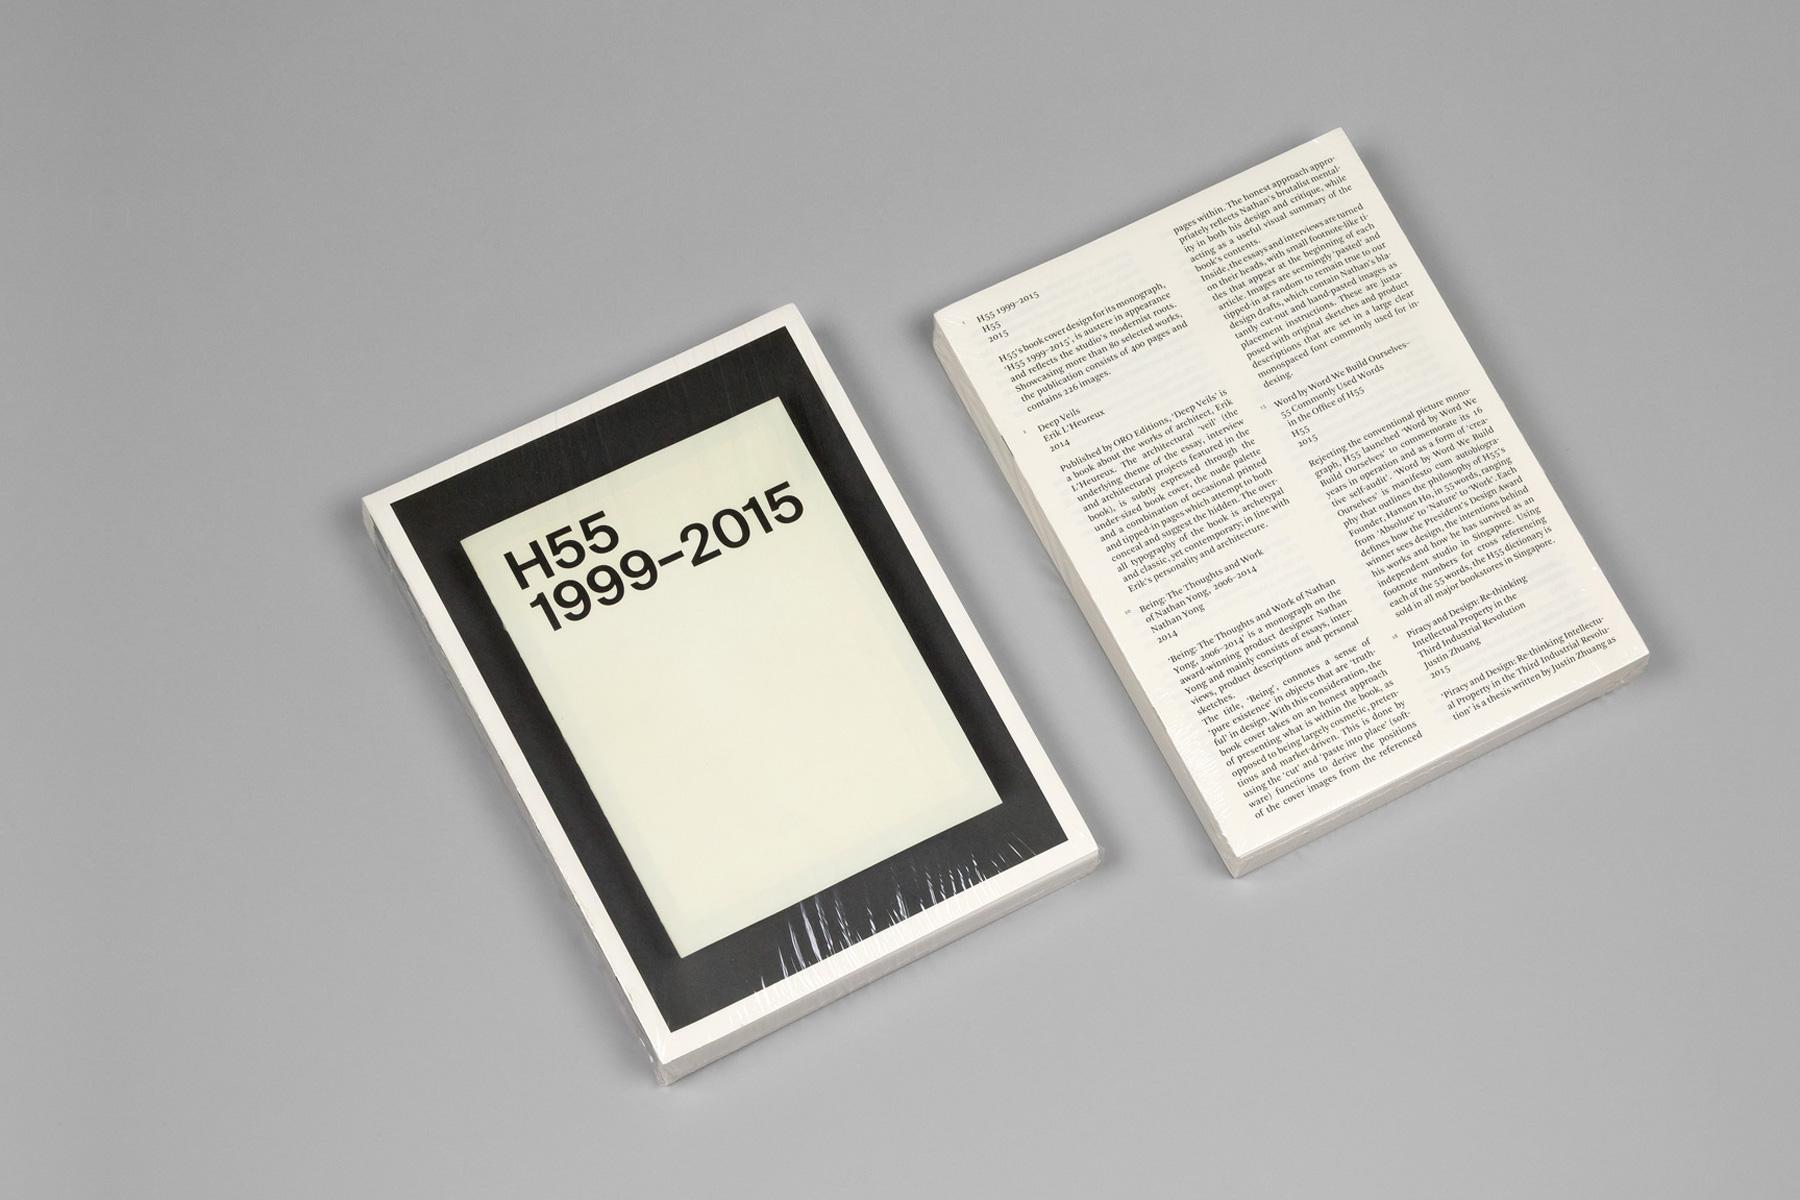 H55-Monograph-1